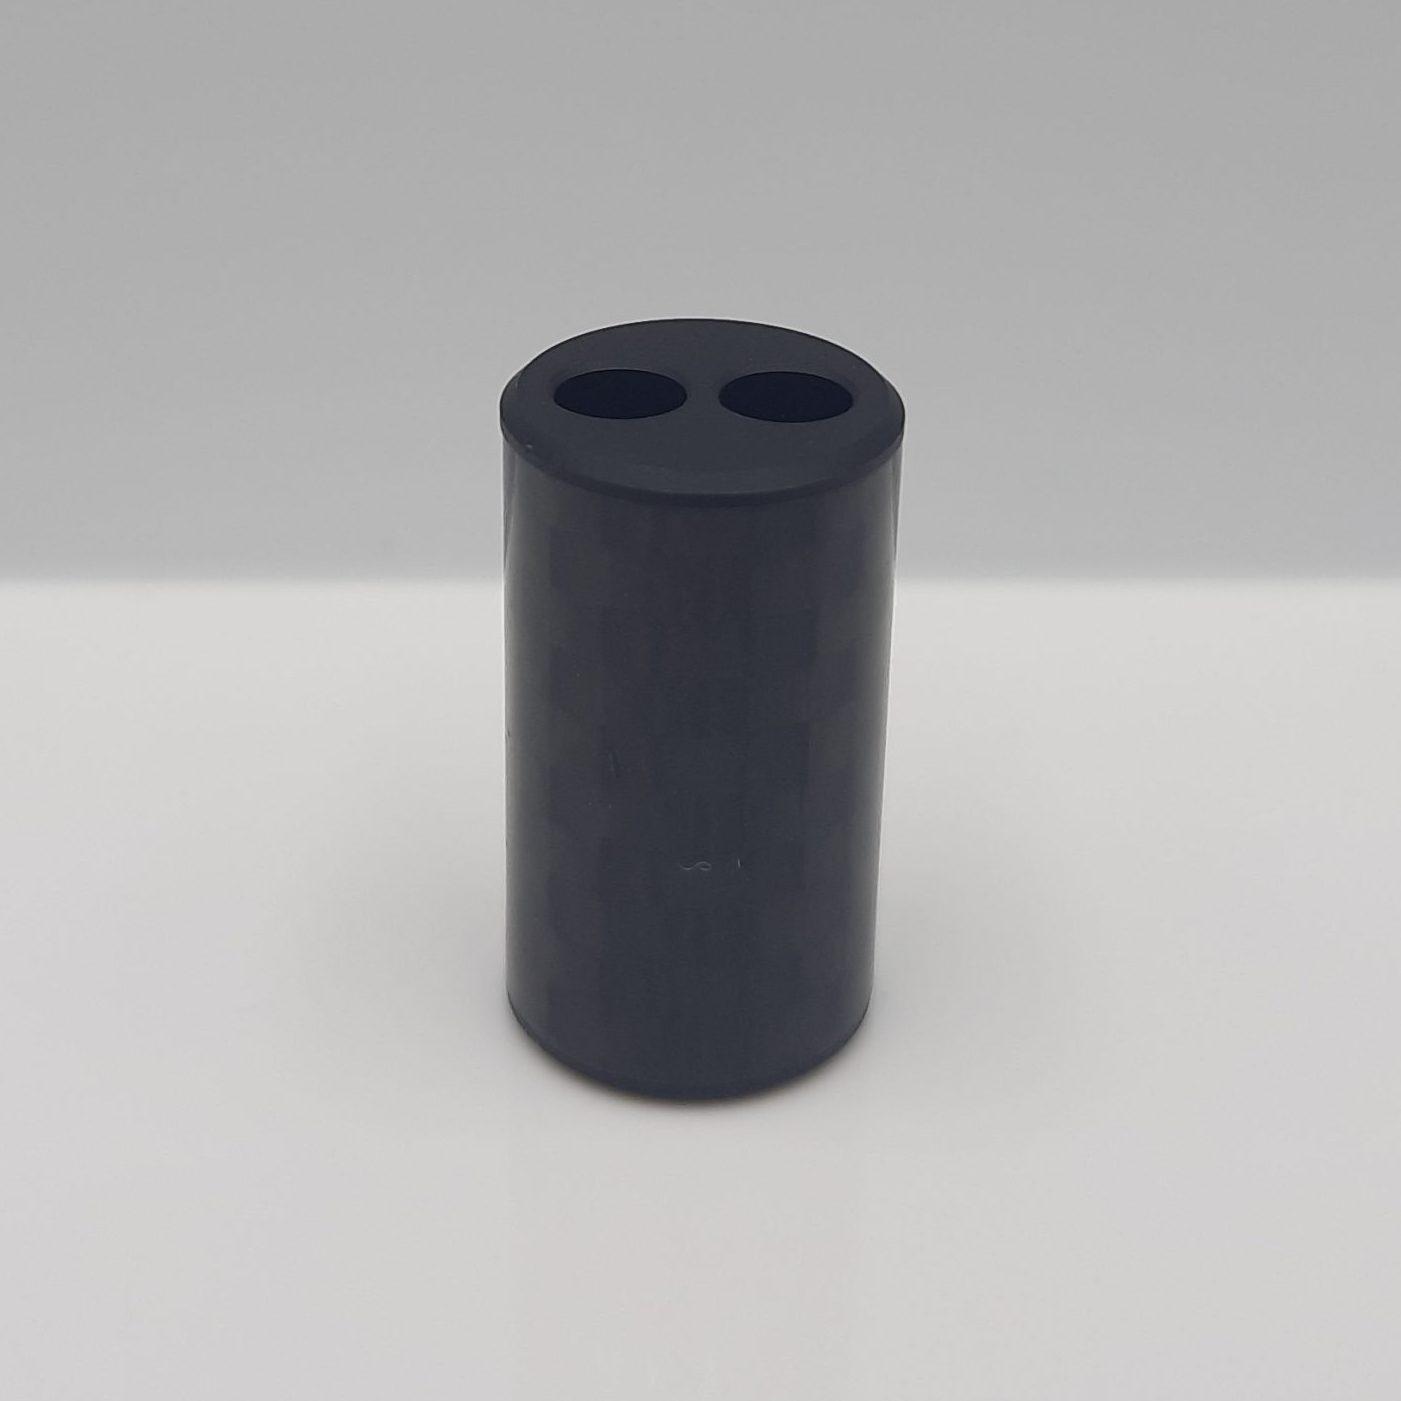 PLUSSOUND Premium Y-Splitter